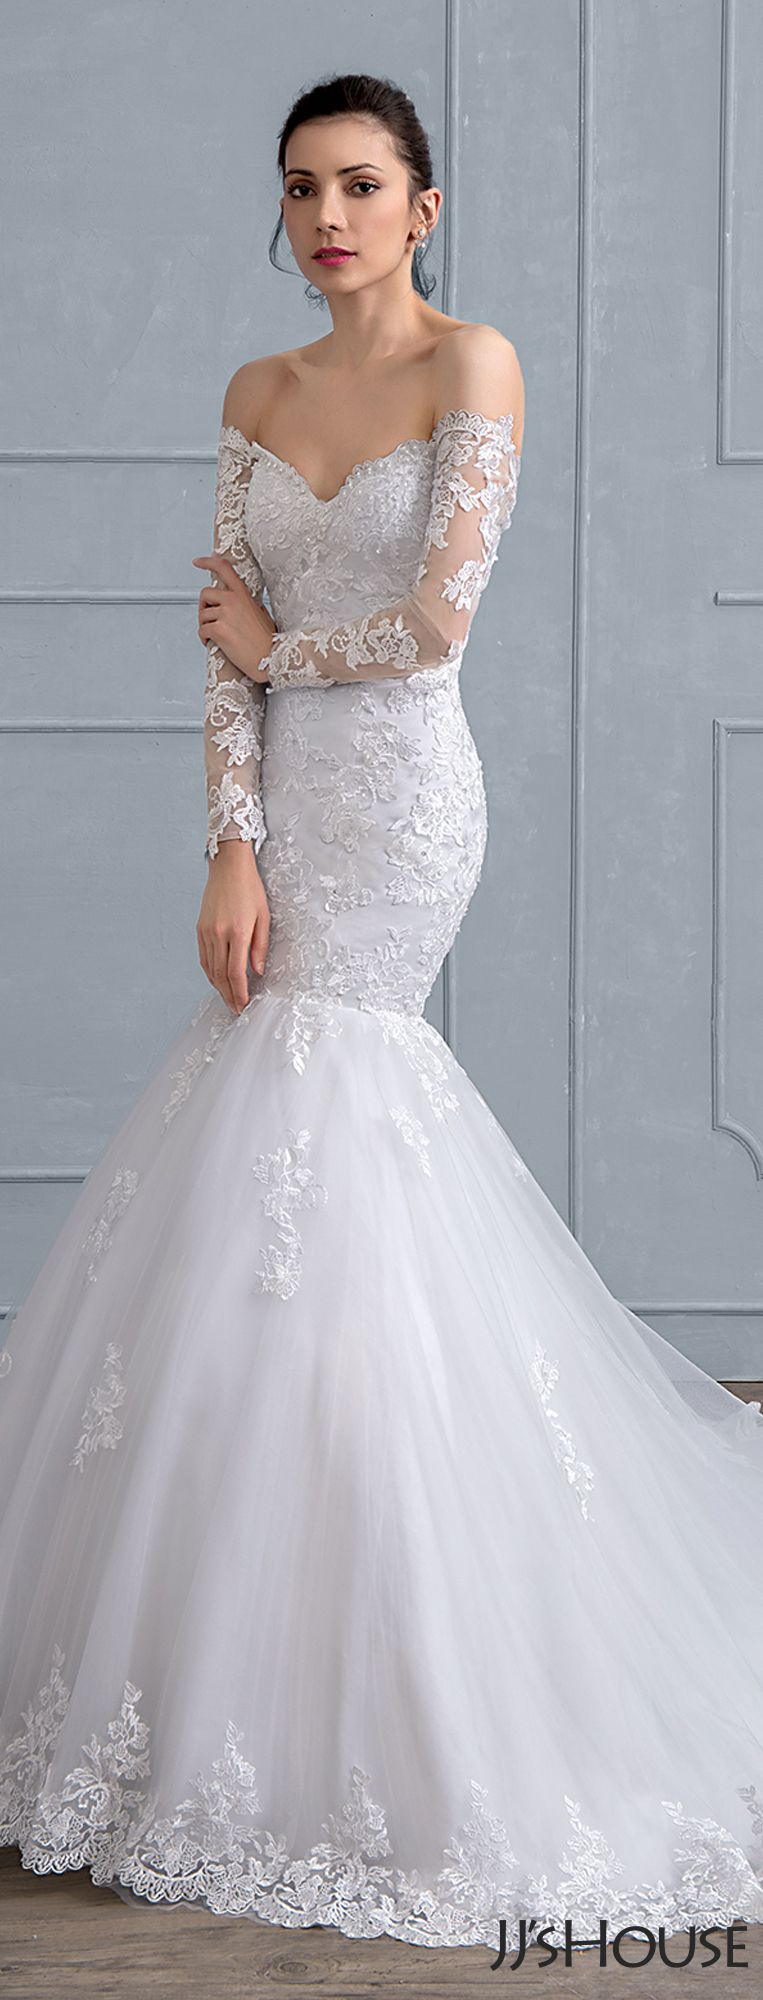 Us 345 00 Trumpet Mermaid V Neck Court Train Tulle Lace Wedding Dress Jj S House Wedding Dresses Lace Online Wedding Dress Affordable Wedding Dresses [ 1562 x 1140 Pixel ]